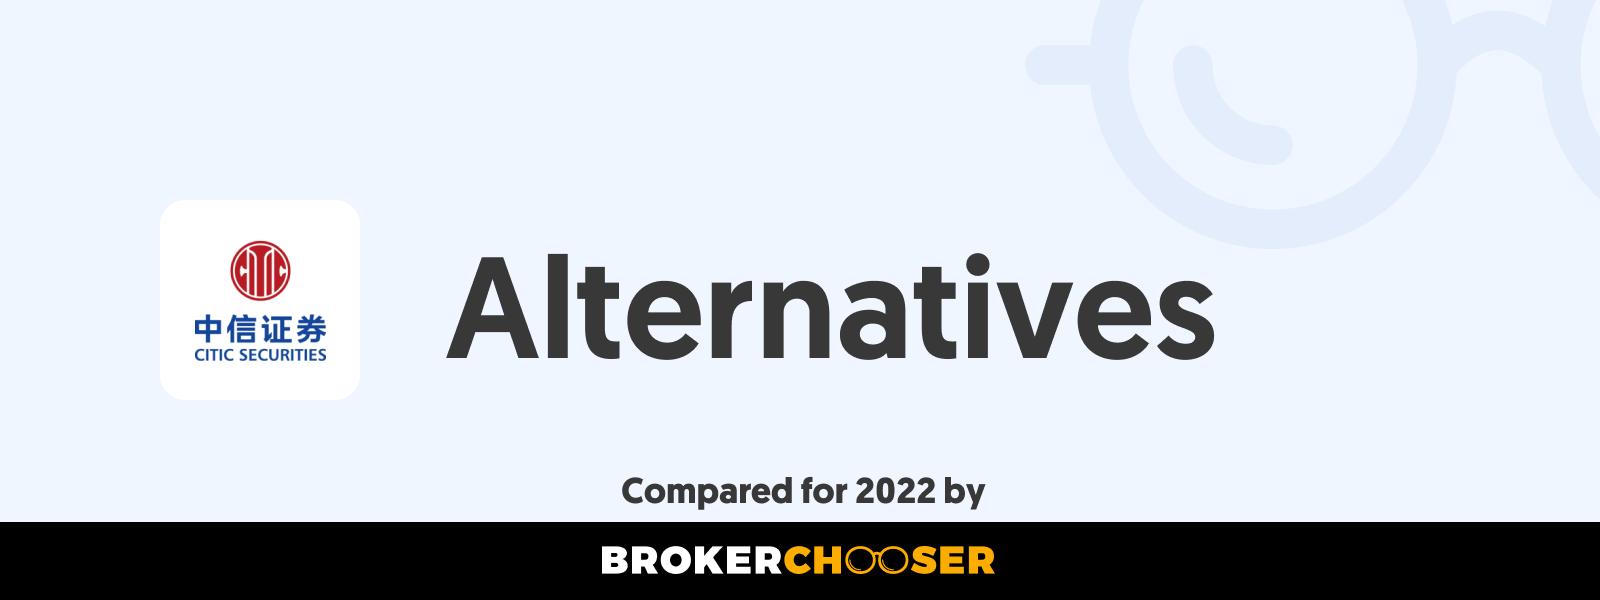 Citic Securities Alternatives